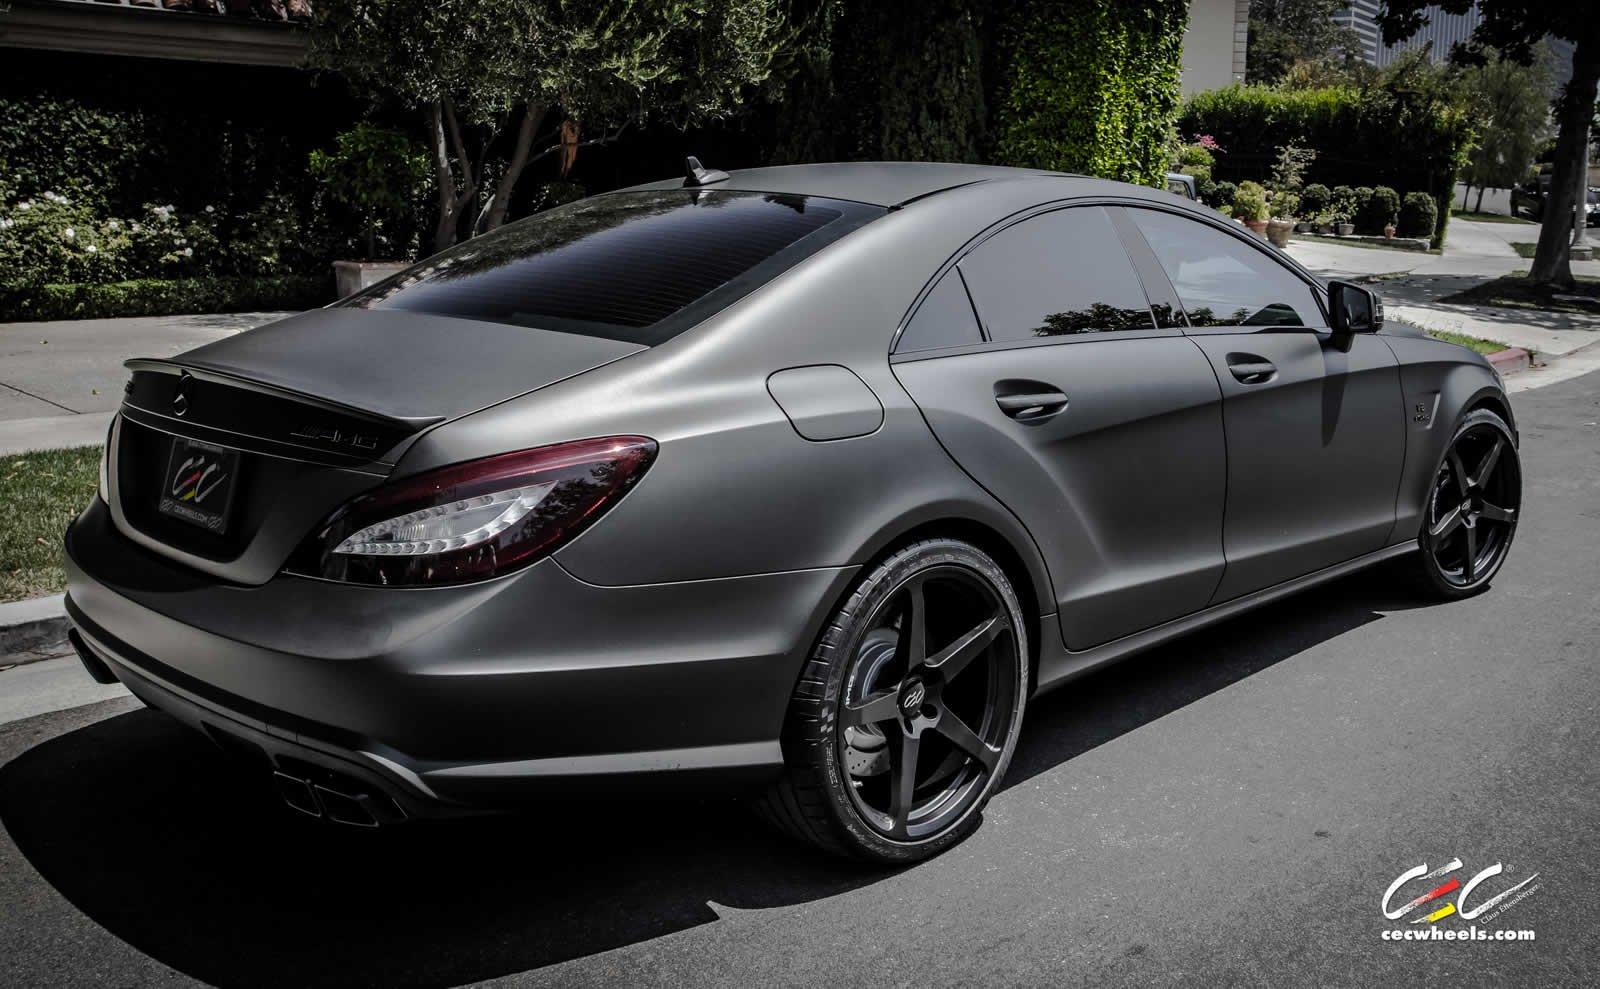 2015 cec wheels tuning cars mercedes benz carlsson cls 63 amg wallpaper 1600x989 617804. Black Bedroom Furniture Sets. Home Design Ideas